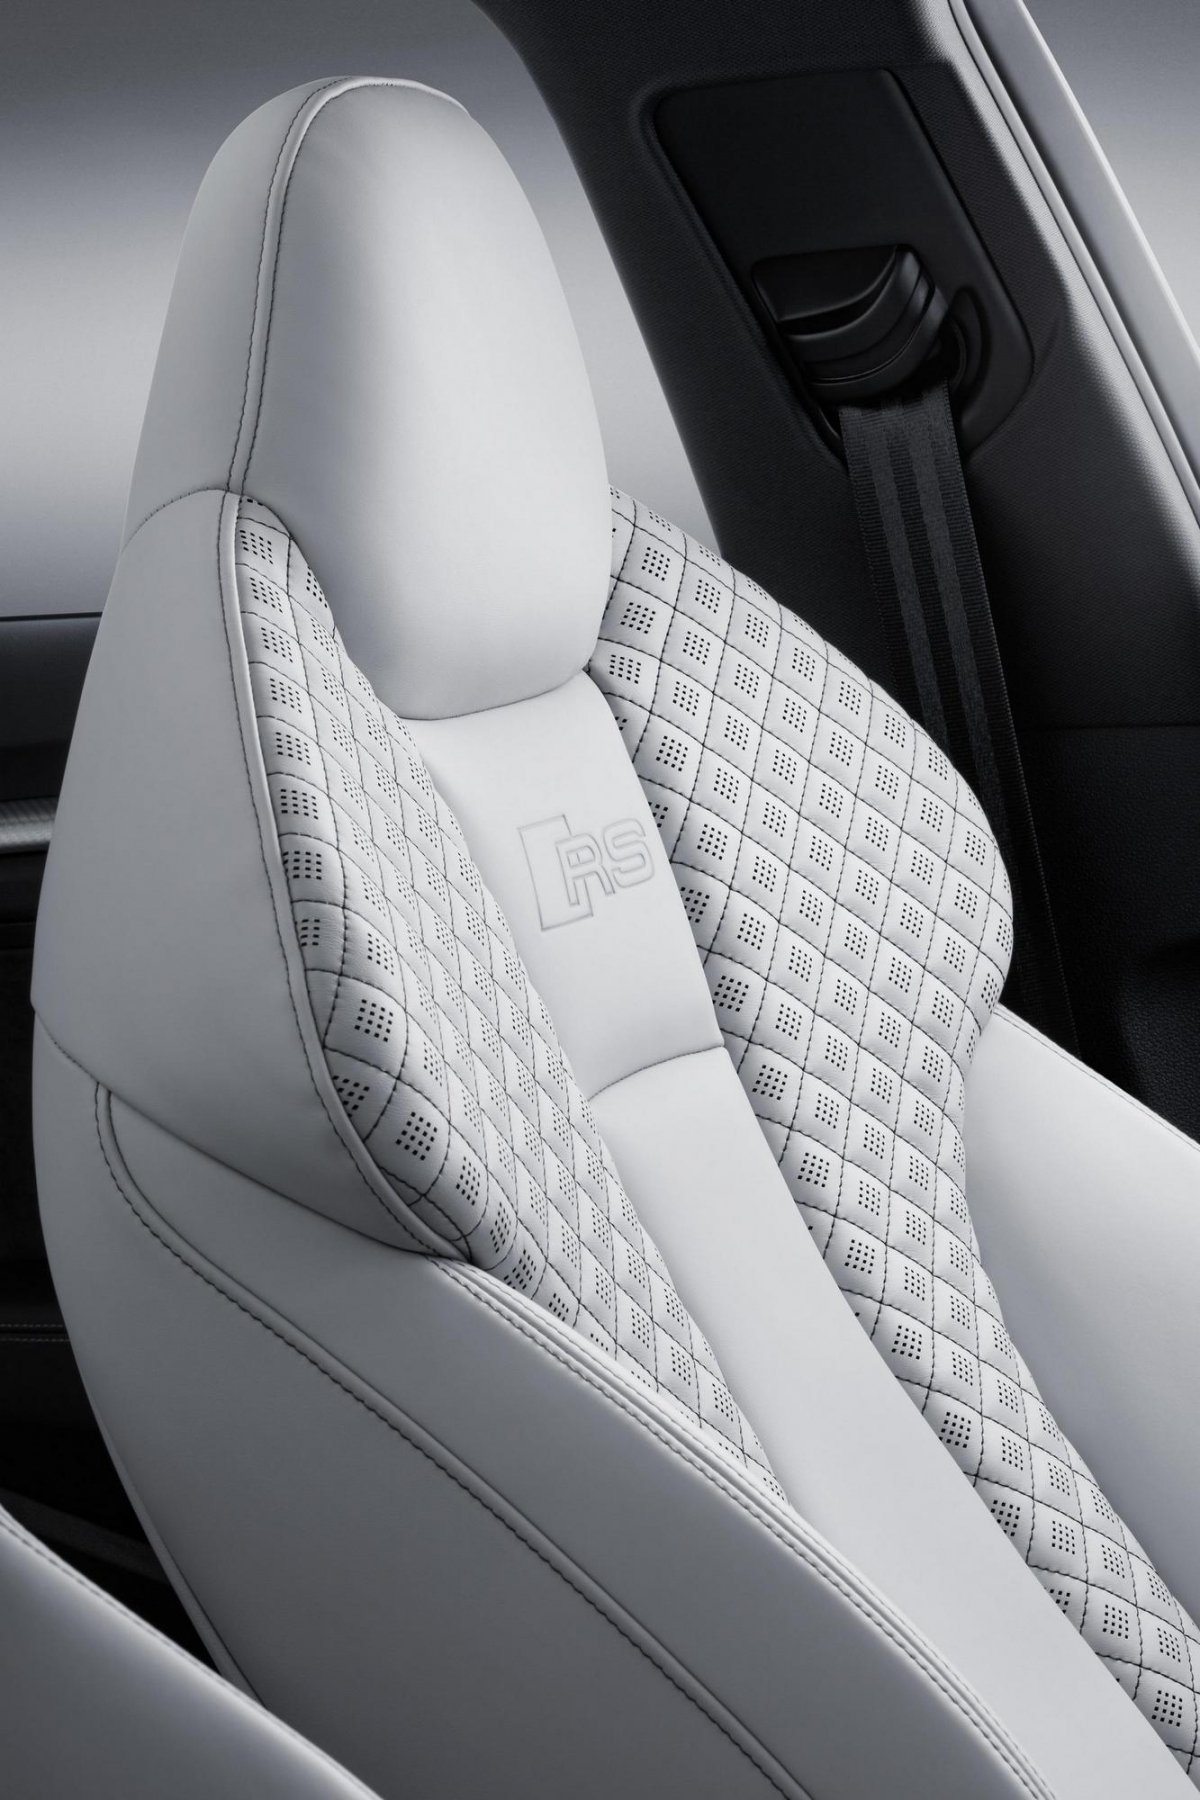 Audi rs3 vs mercedes amg a45 a comparison review for Audi rs3 scheda tecnica